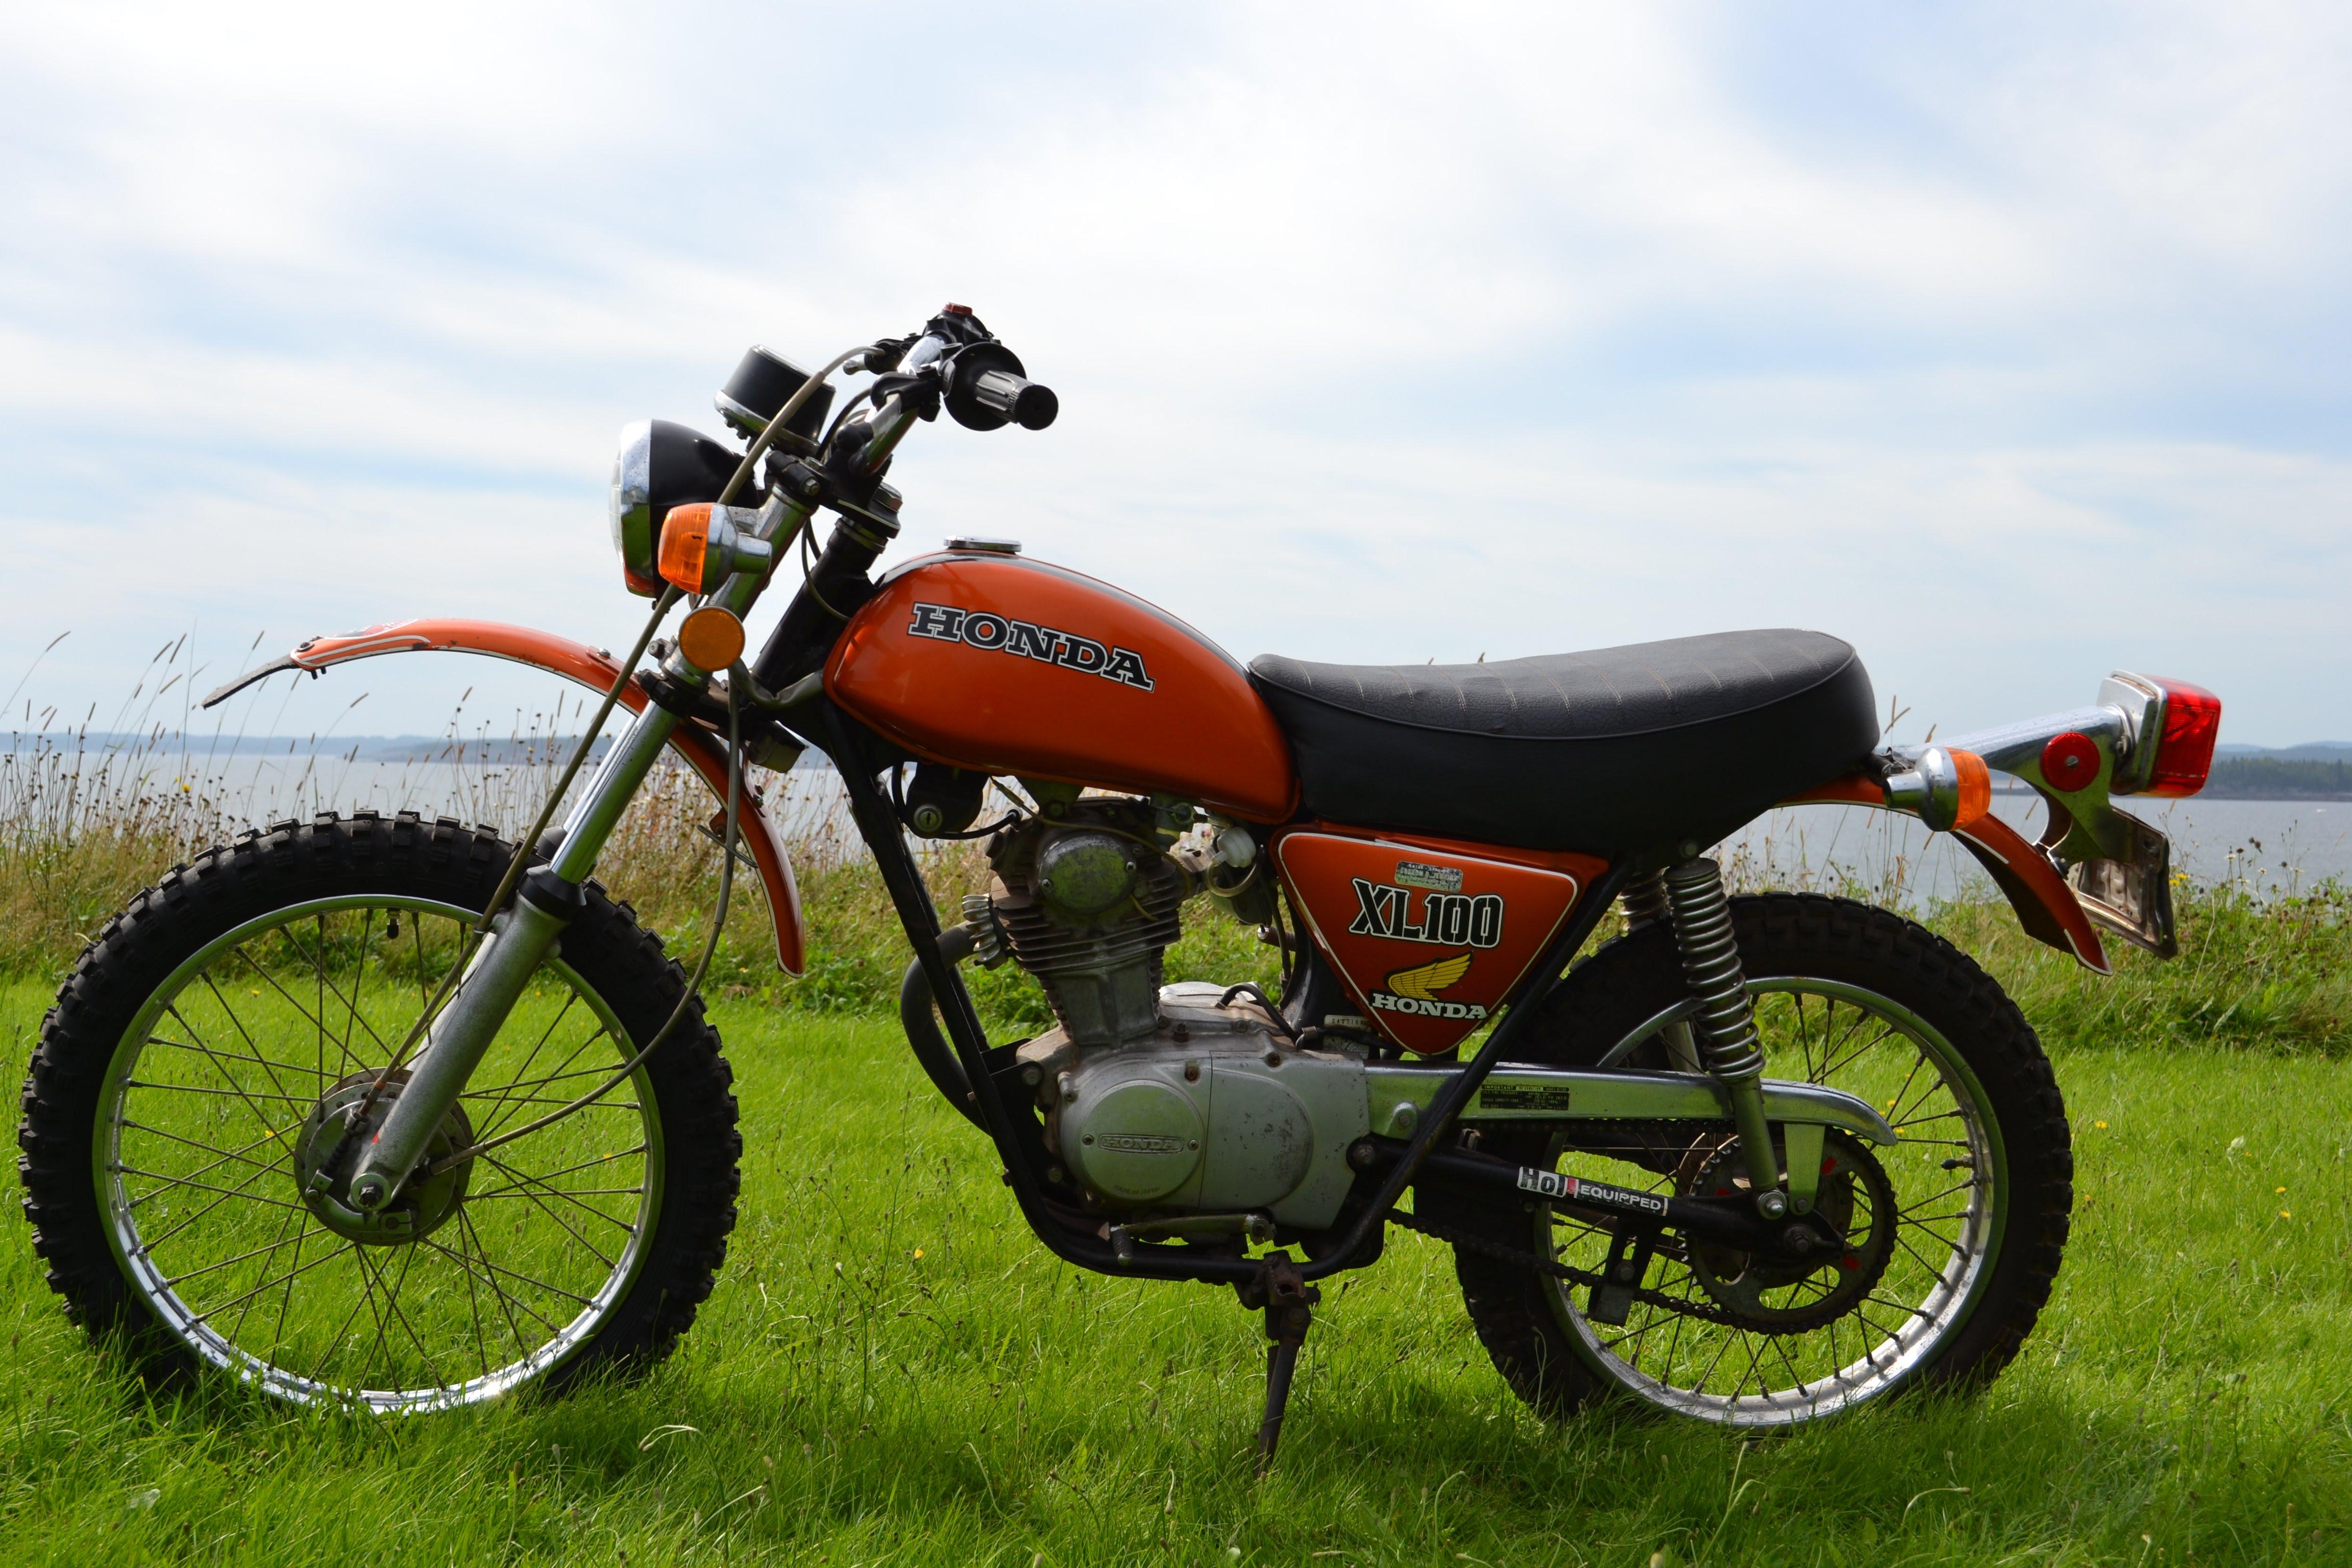 1974 Honda Xl100 Wiring Diagram Detailed Schematic Diagrams Kawasaki Bajaj Ct 100 Xl Home Custom Xl350